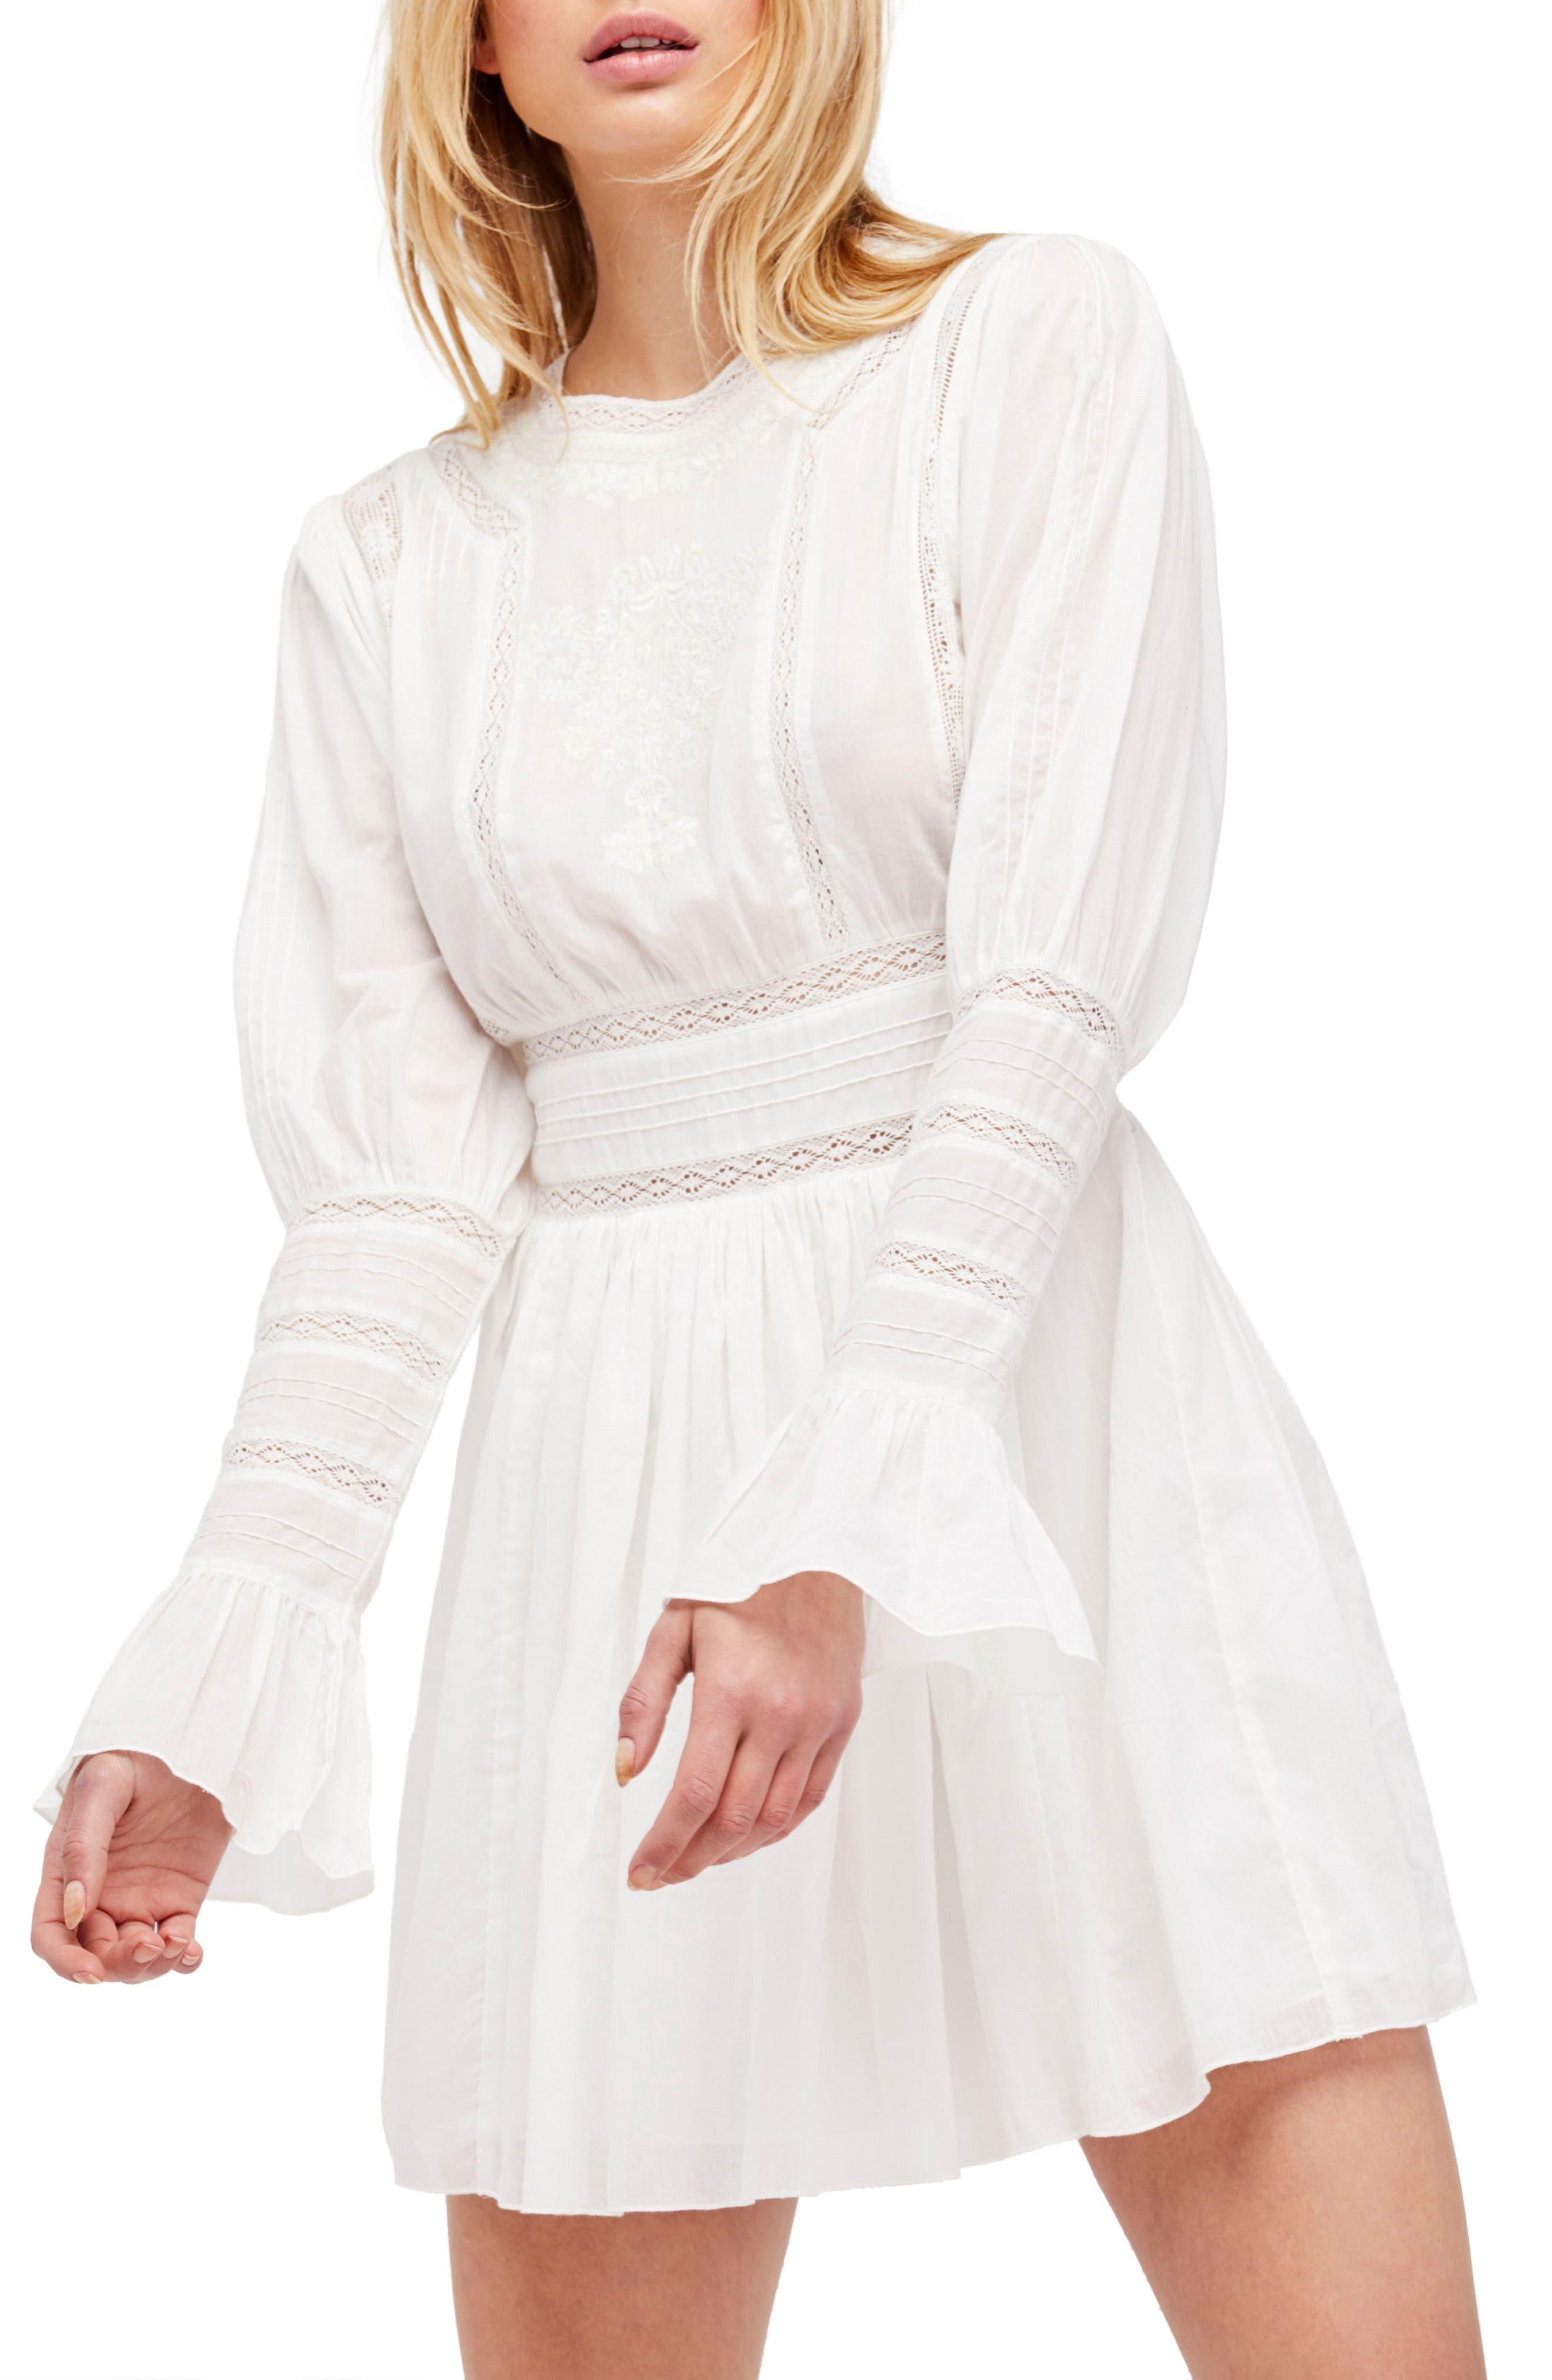 Alternate Image 1 Selected - Free People Victorian Minidress